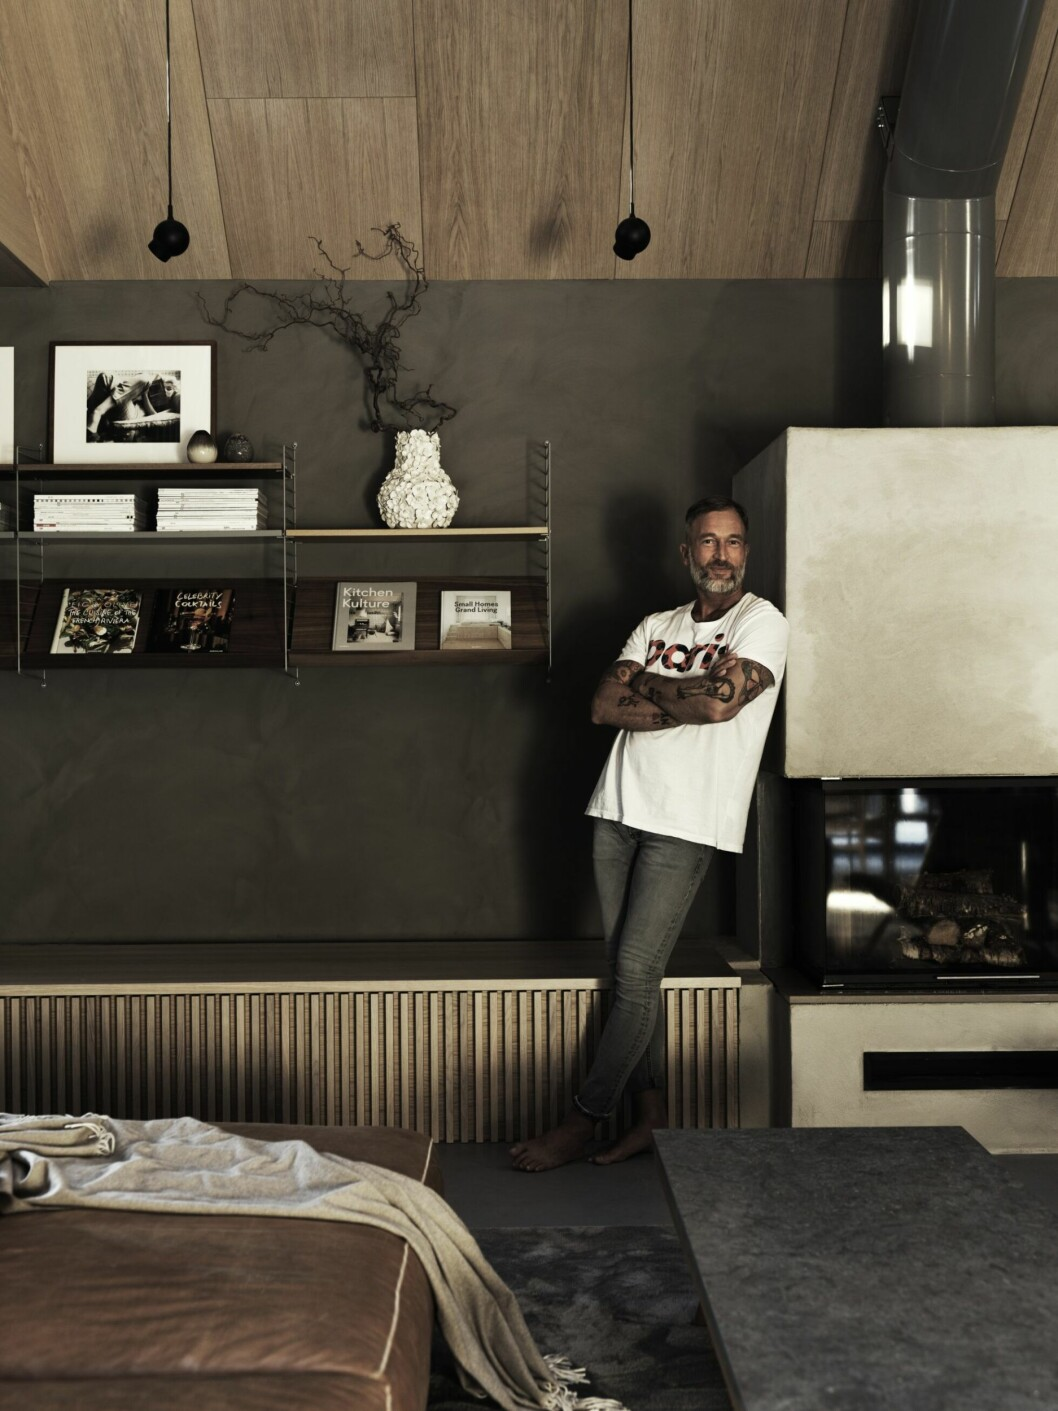 Martin Nygren i sitt hem i Skåne